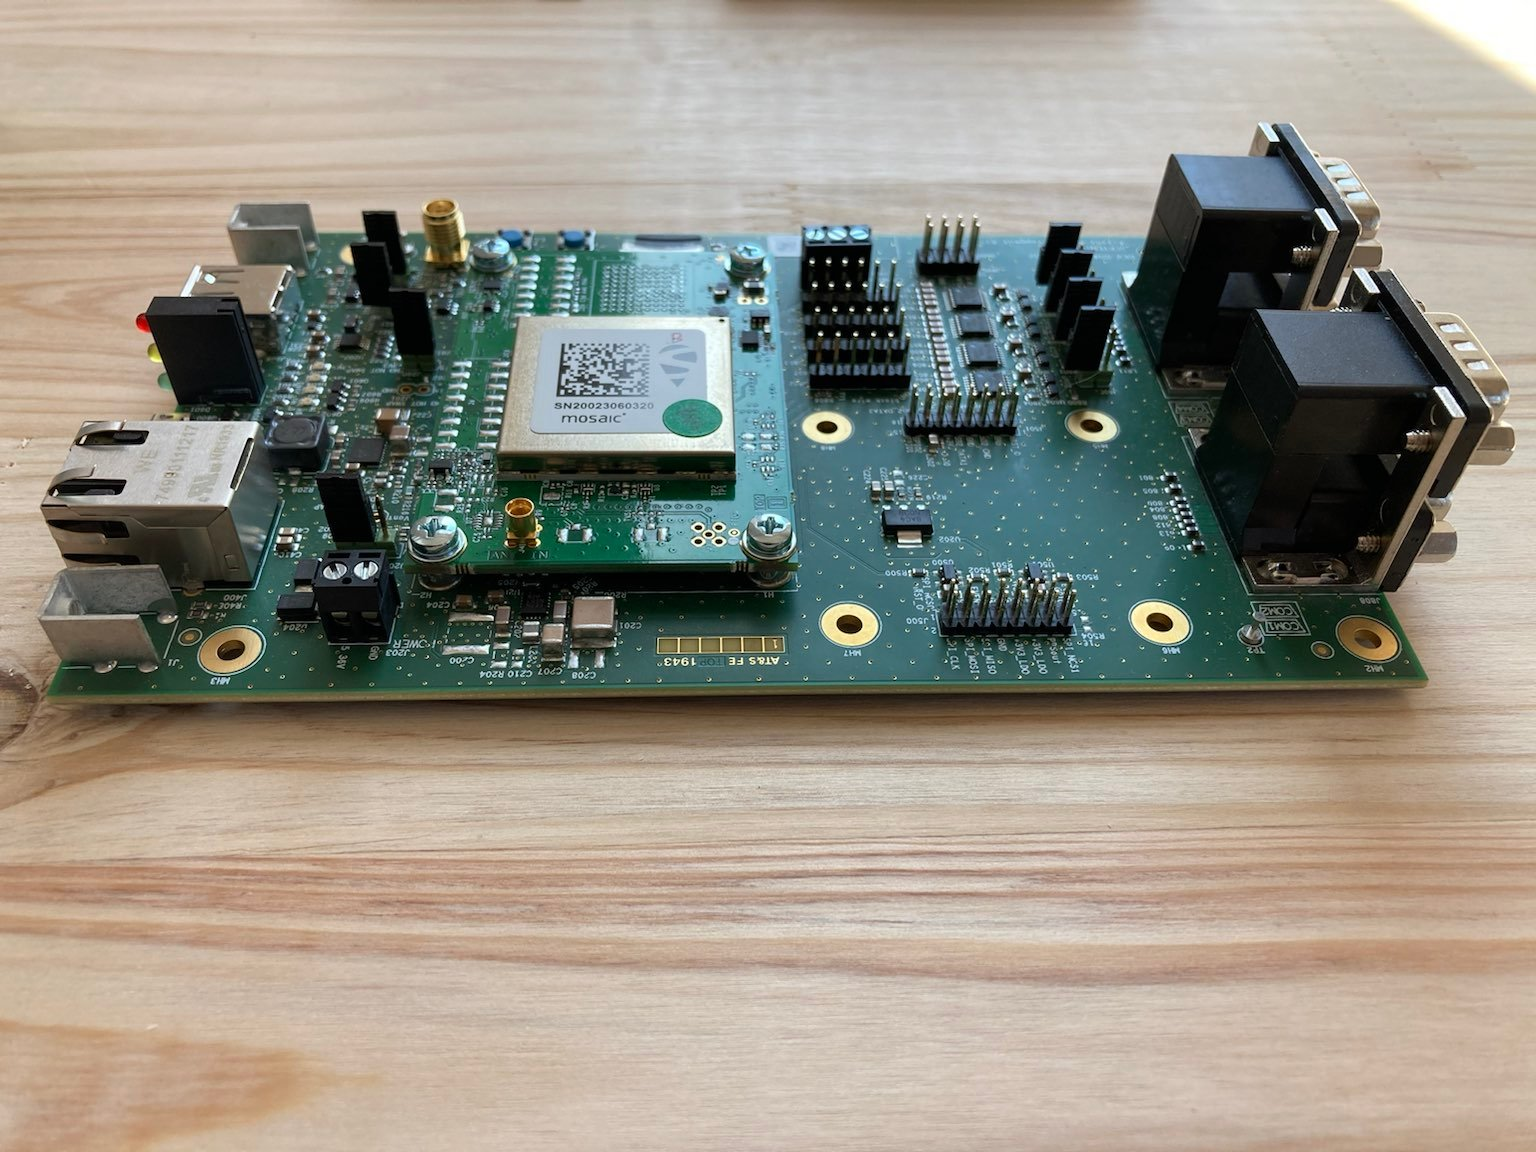 Plug&Play RTK with Septentrio mosaic-X5 Dev Kit